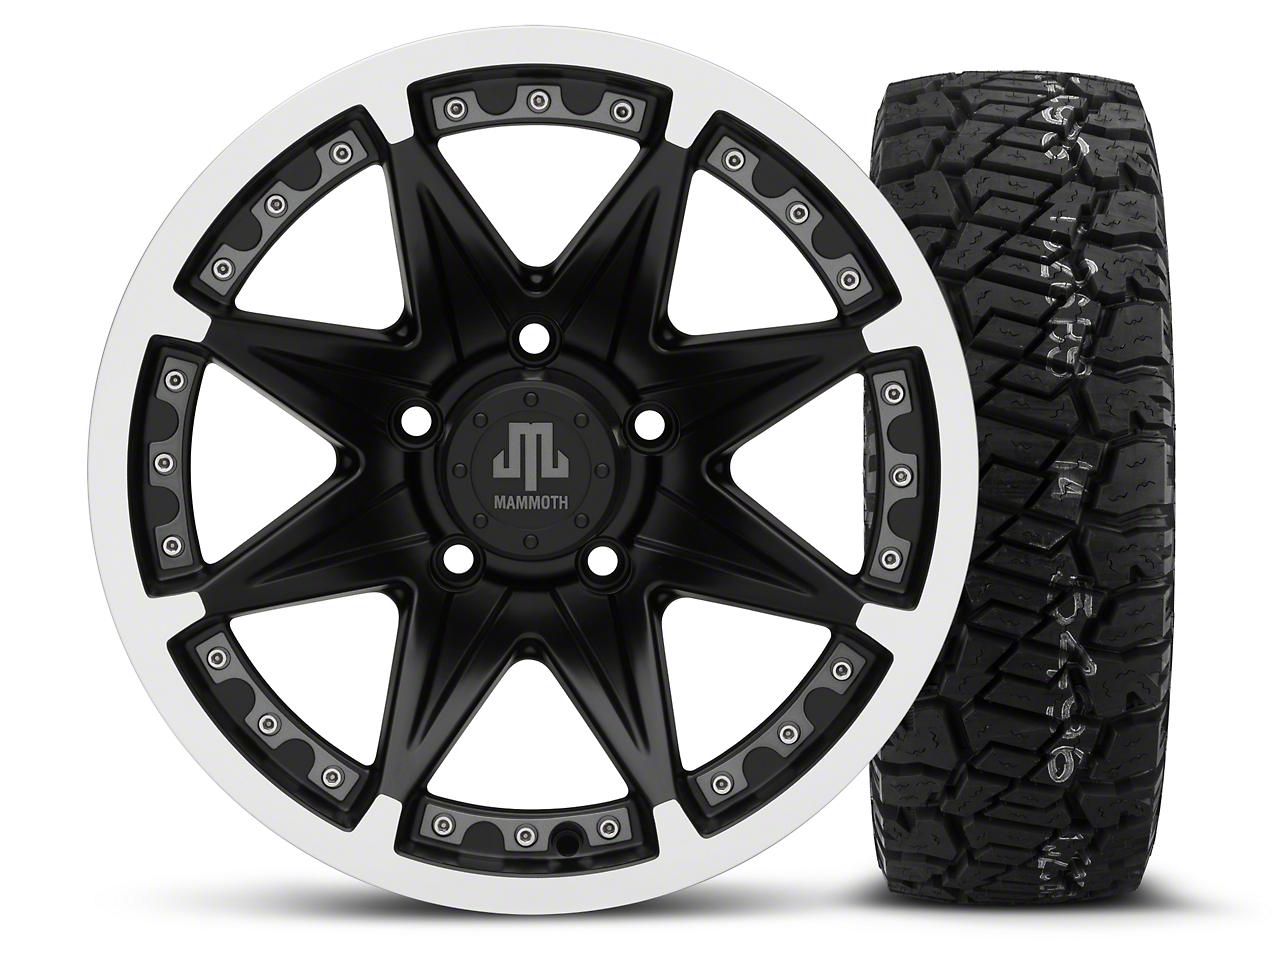 Mammoth Type 88 Black - 16x8 Wheel - and Dick Cepek Fun Country Tire - 285/75R16 (07-18 Jeep Wrangler JK; 2018 Jeep Wrangler JL)